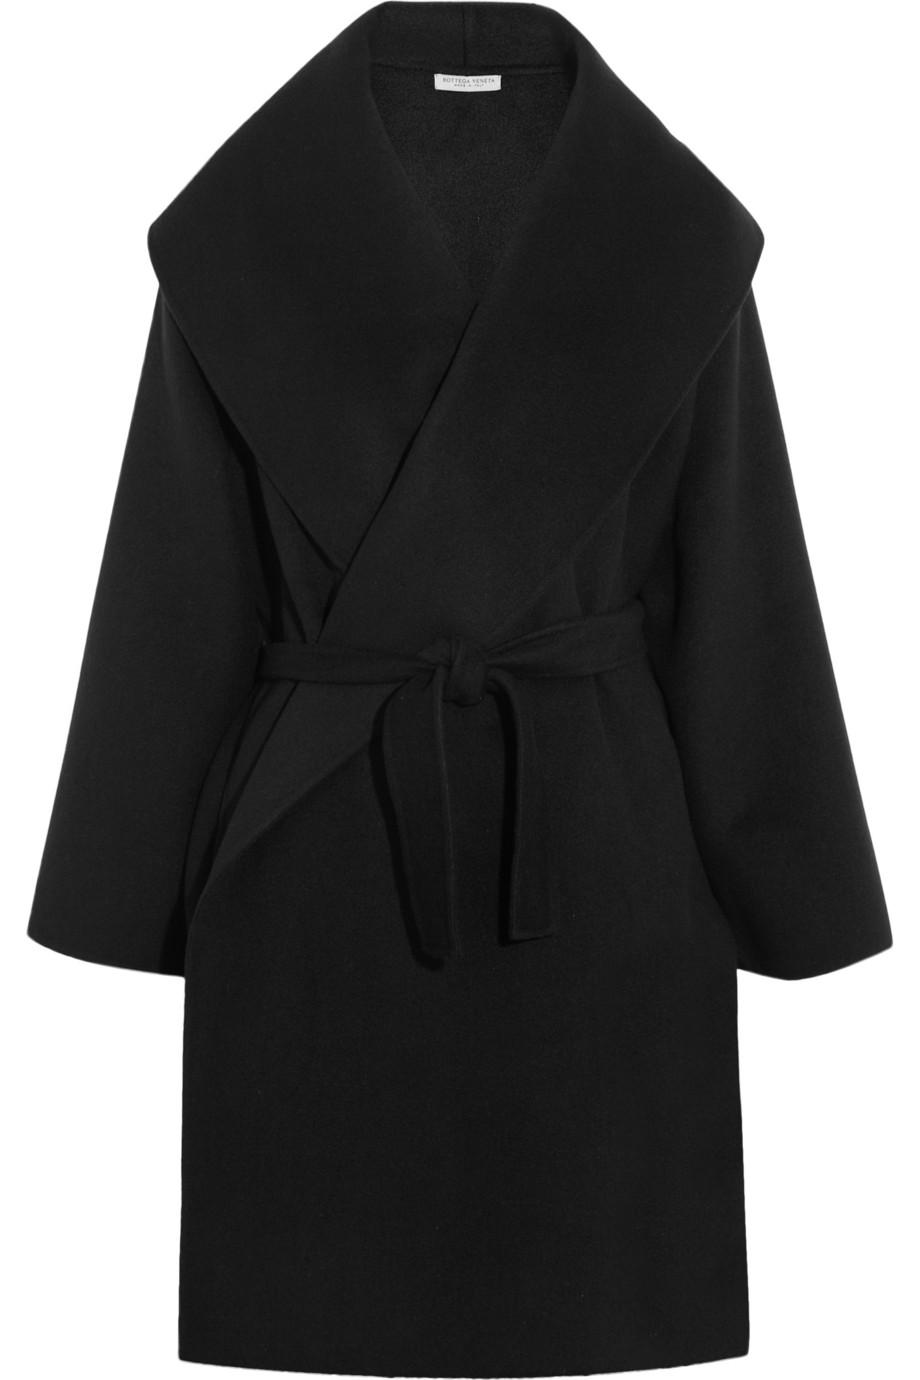 Bottega veneta Belted Cashmere Coat in Black   Lyst